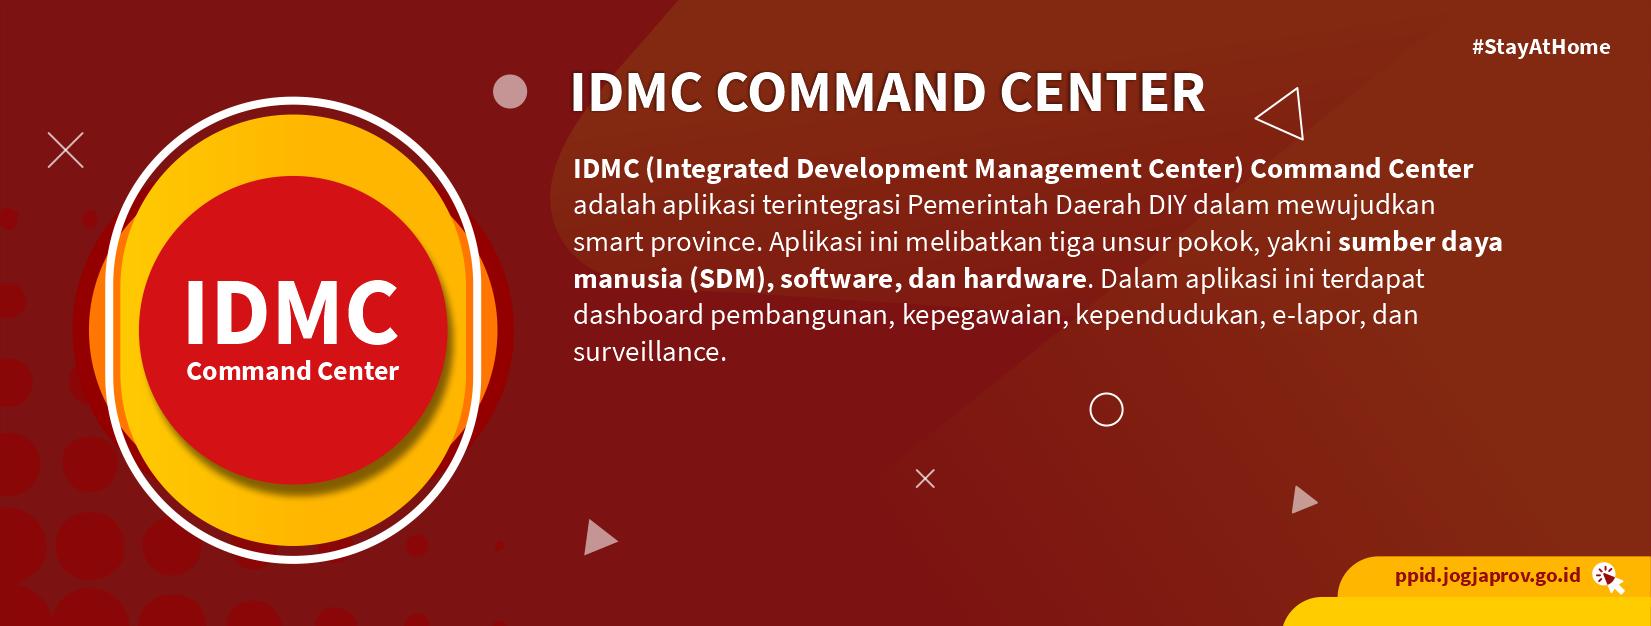 IDMC Command Center